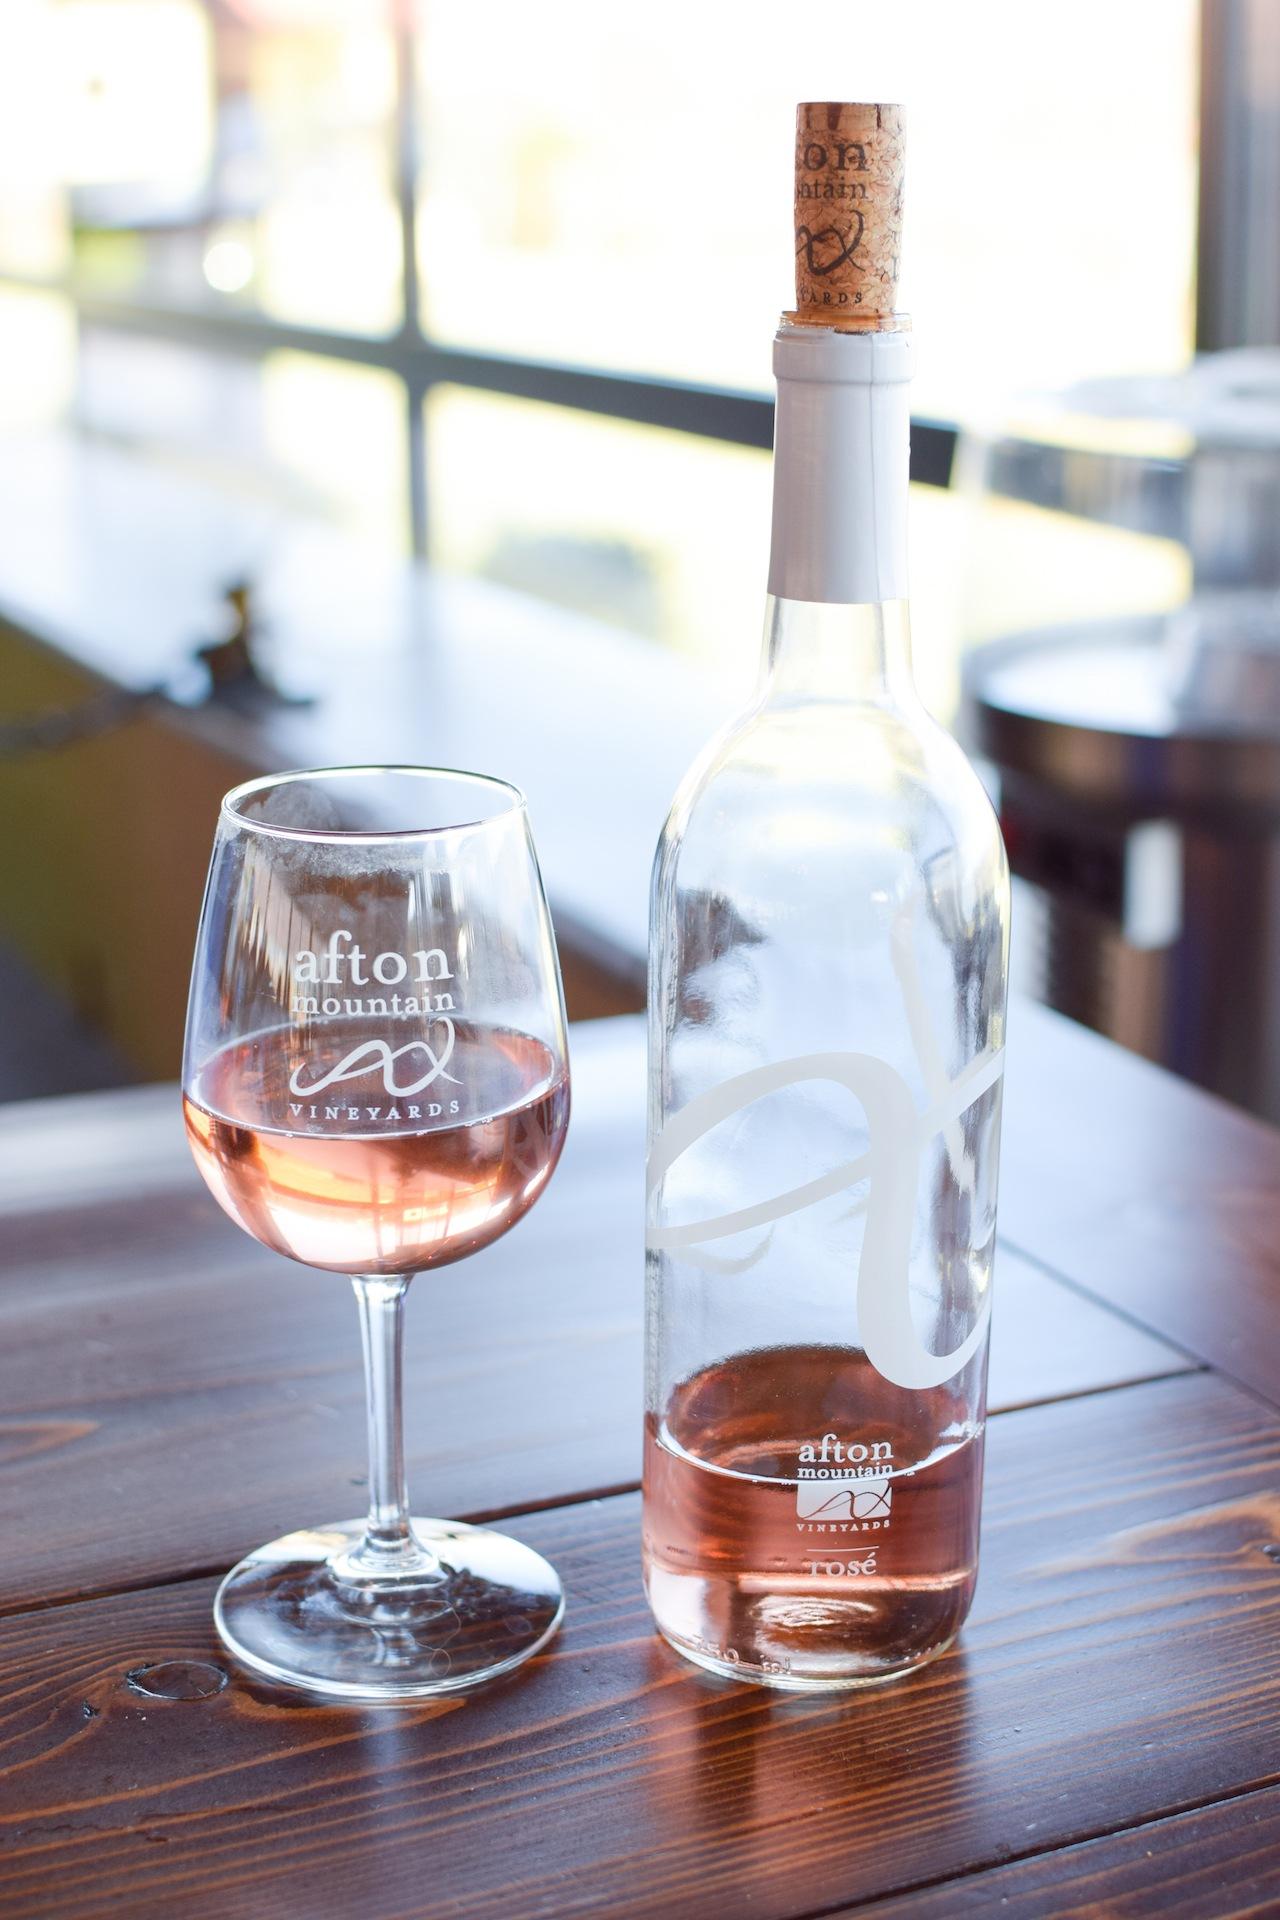 afton mountain vineyards review